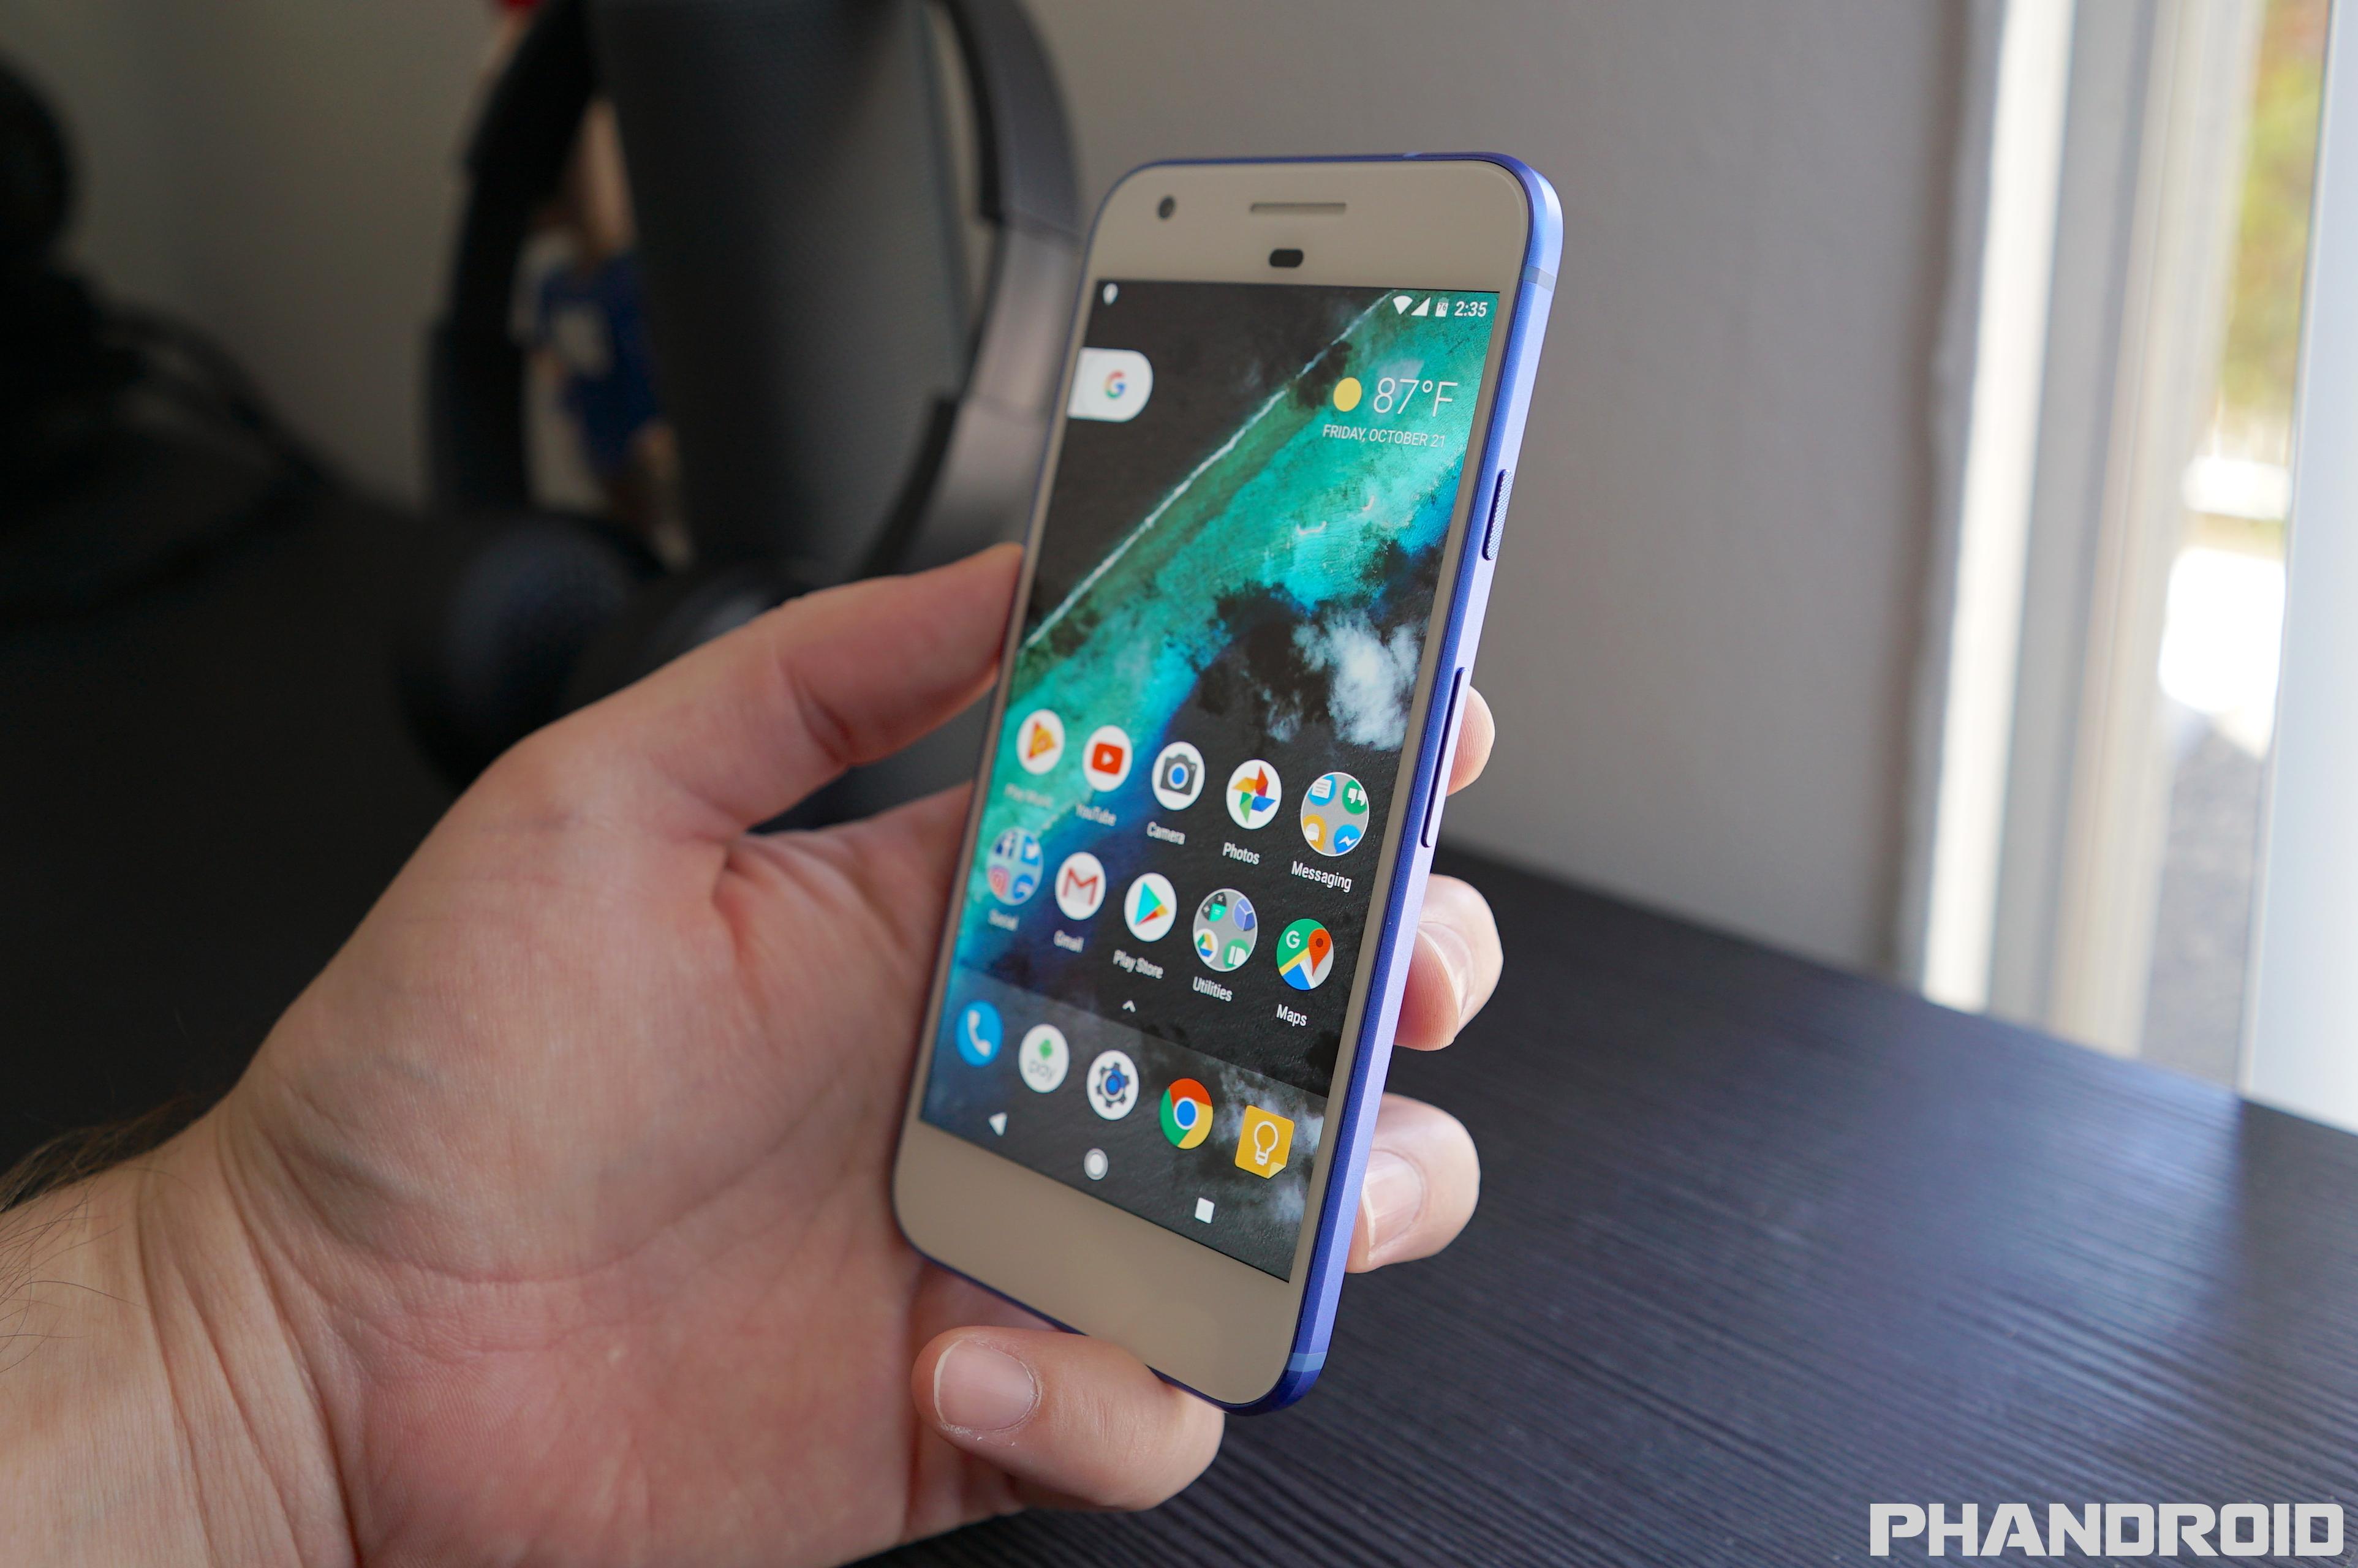 custom blue google pixel with black front looks amazing